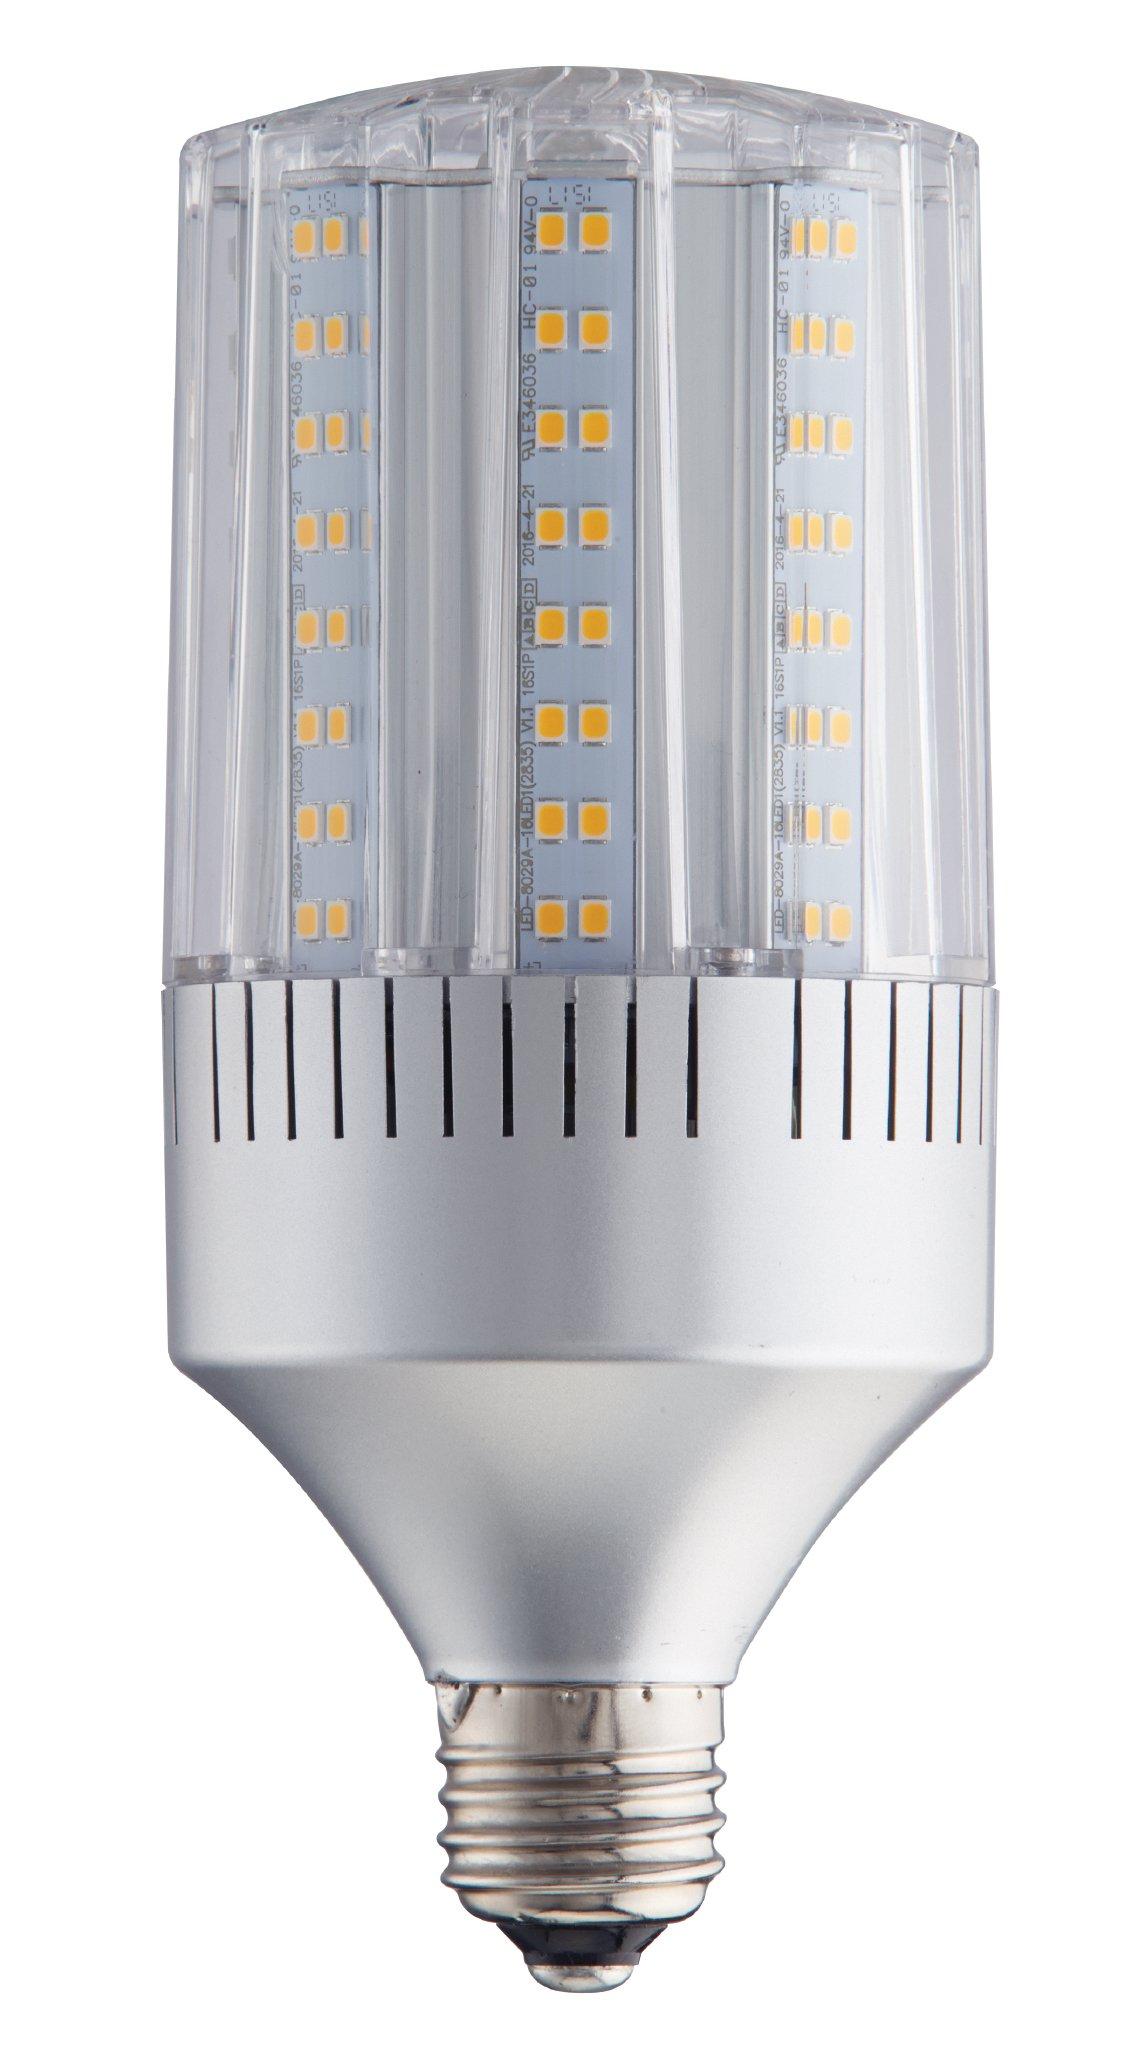 Light Efficient Design LED-8029E40-A Bollard/Post Top Retrofit LED Light